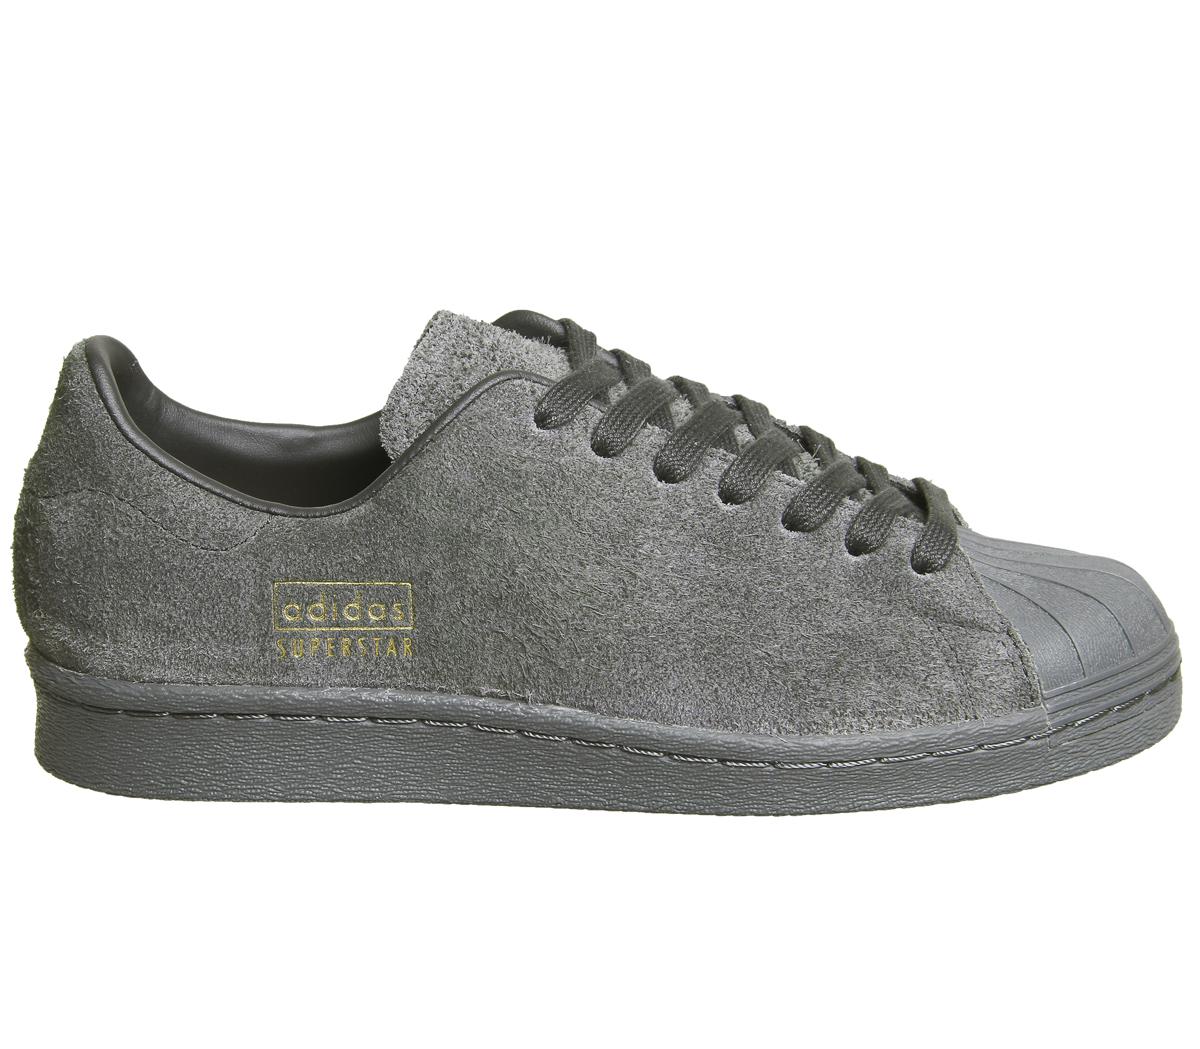 Donna Adidas Originals Superstar anni'80 Scarpe Da Ginnastica in Nero Utility